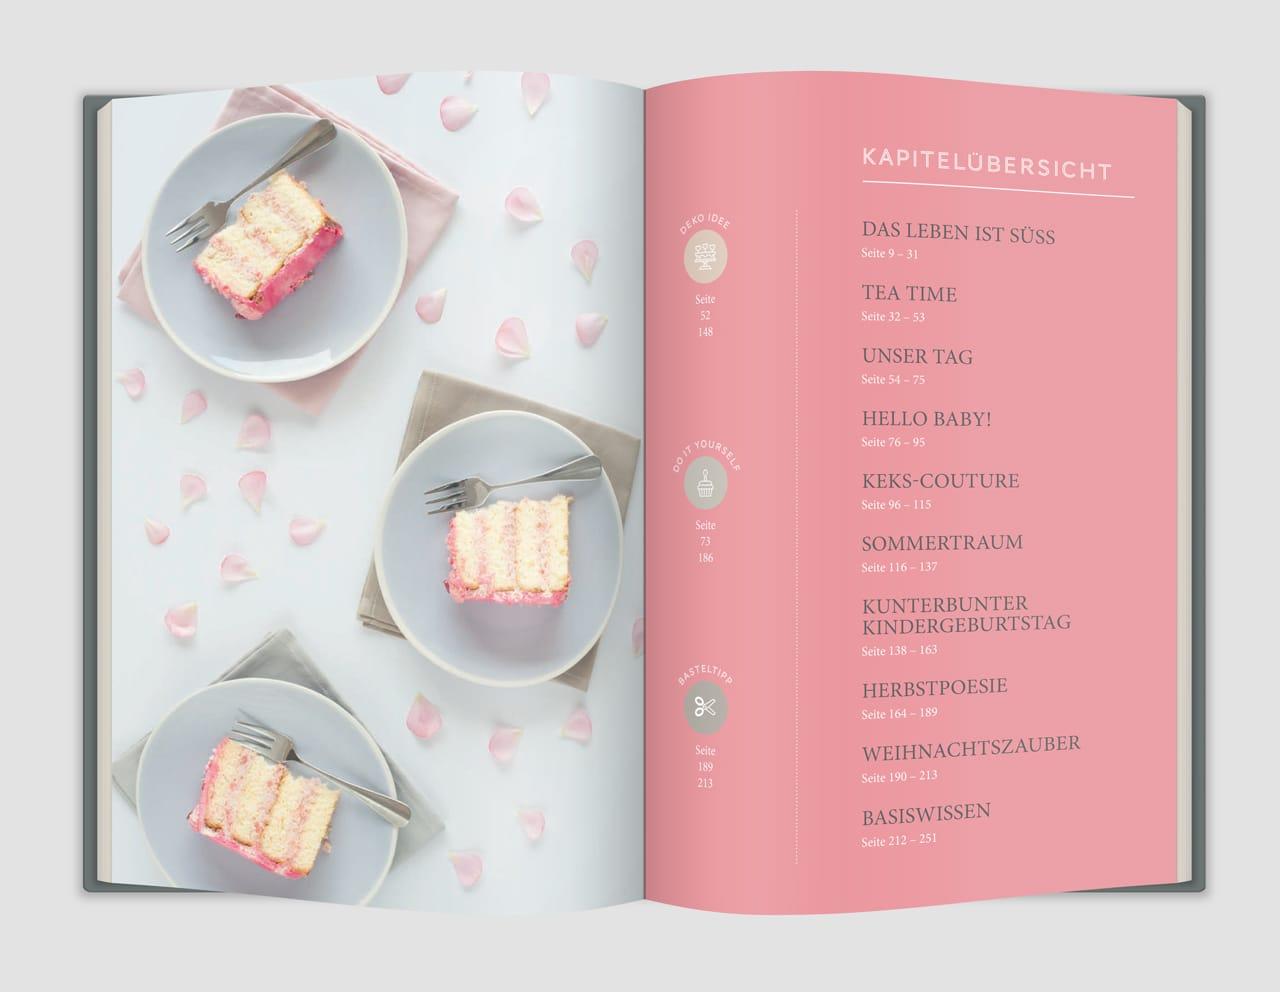 Backbuch: Tortenkunst und Keksdesign, Stephanie Juliette Rinner